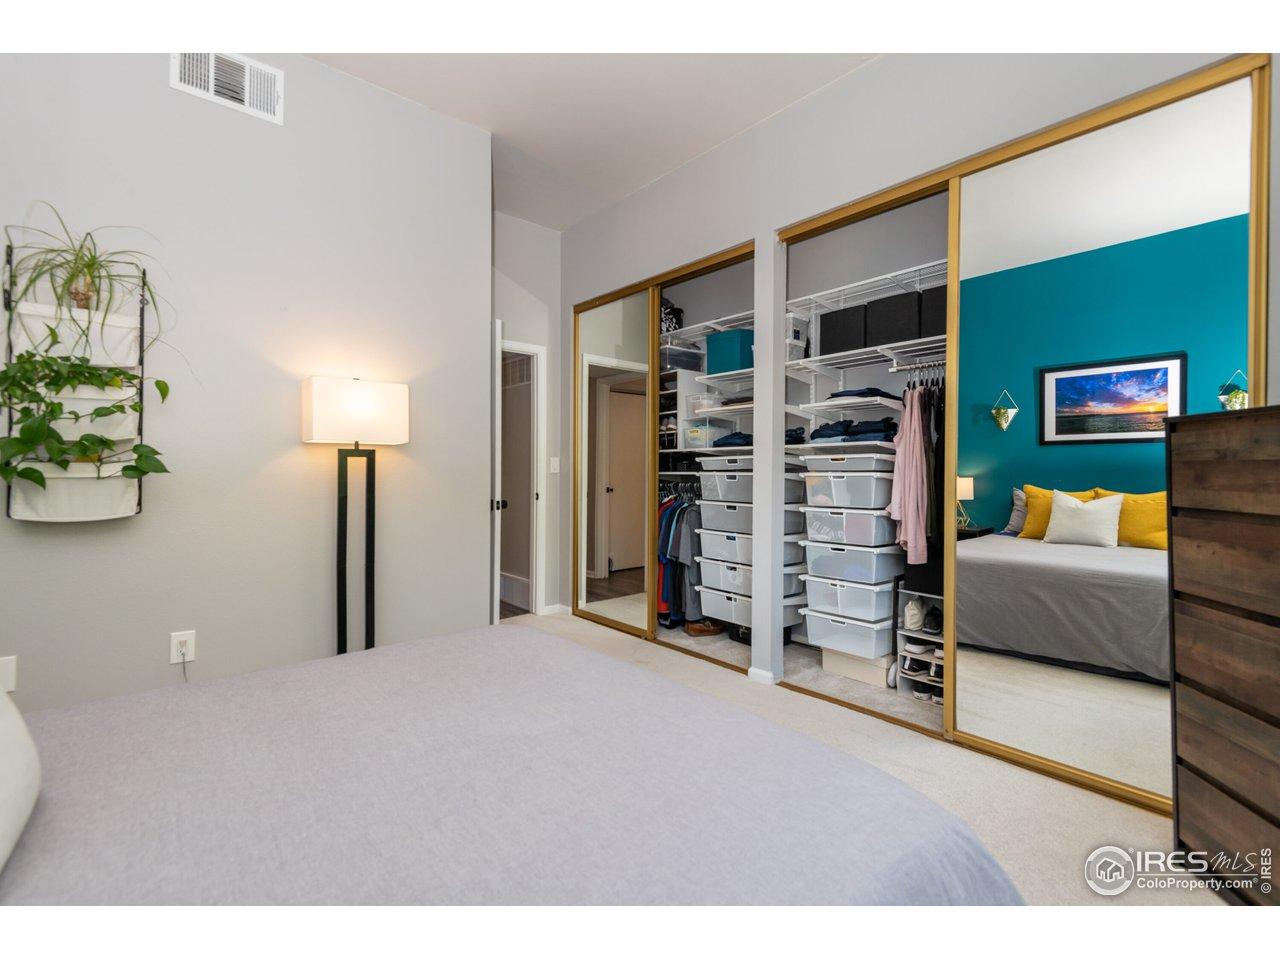 Primary bedroom with Elfa Closet System